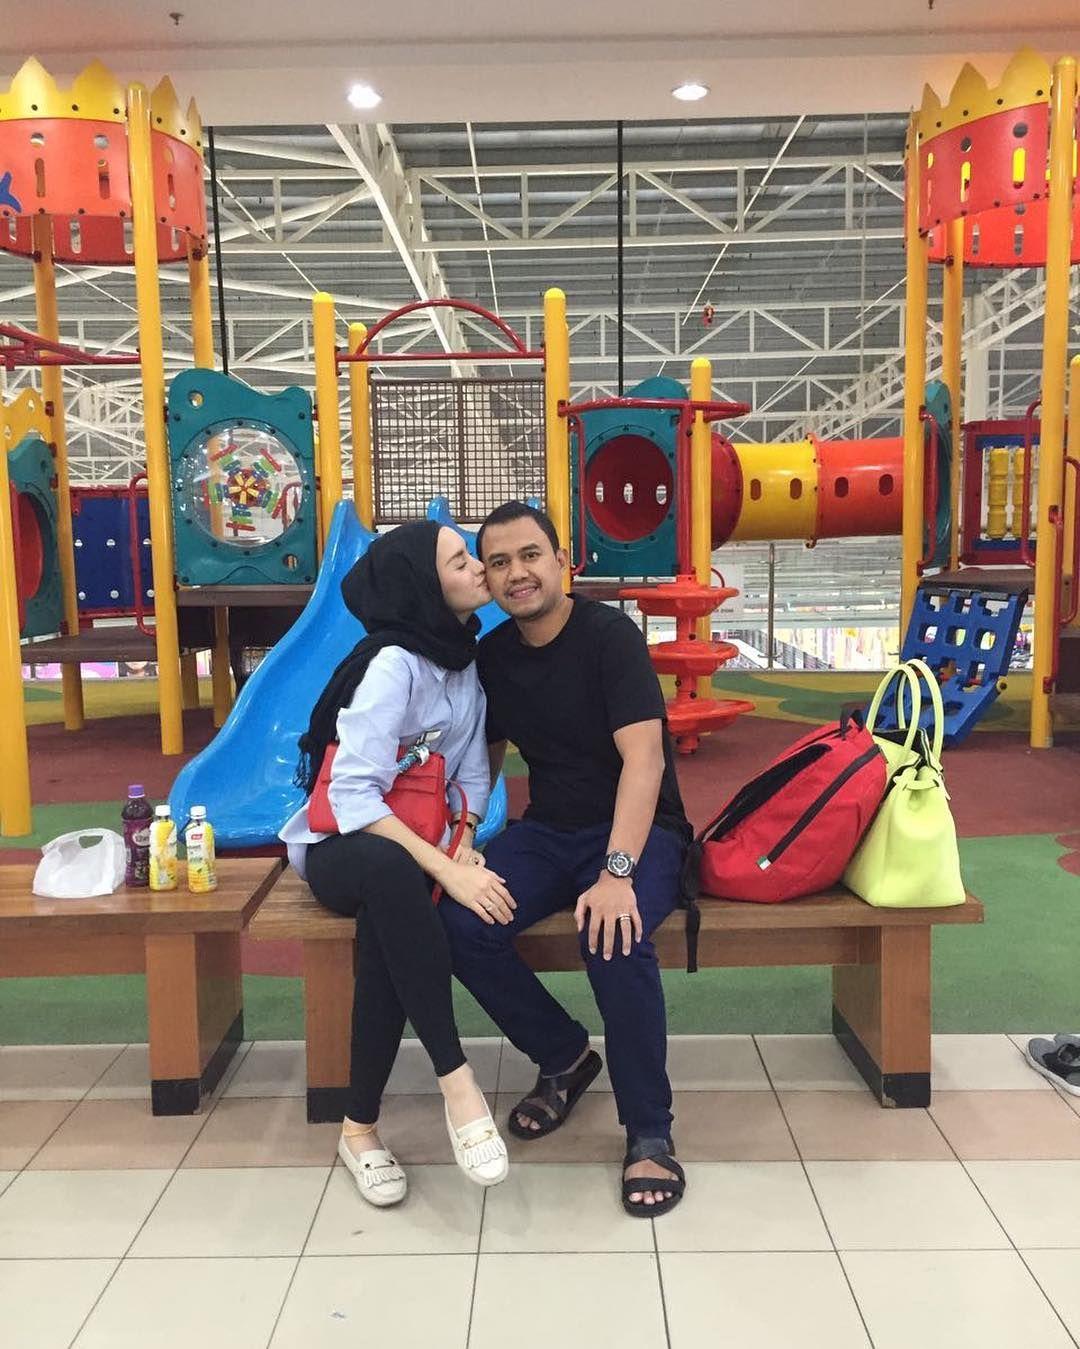 Isu tuntut penceraian Hanez Suraya beri penjelasan dan